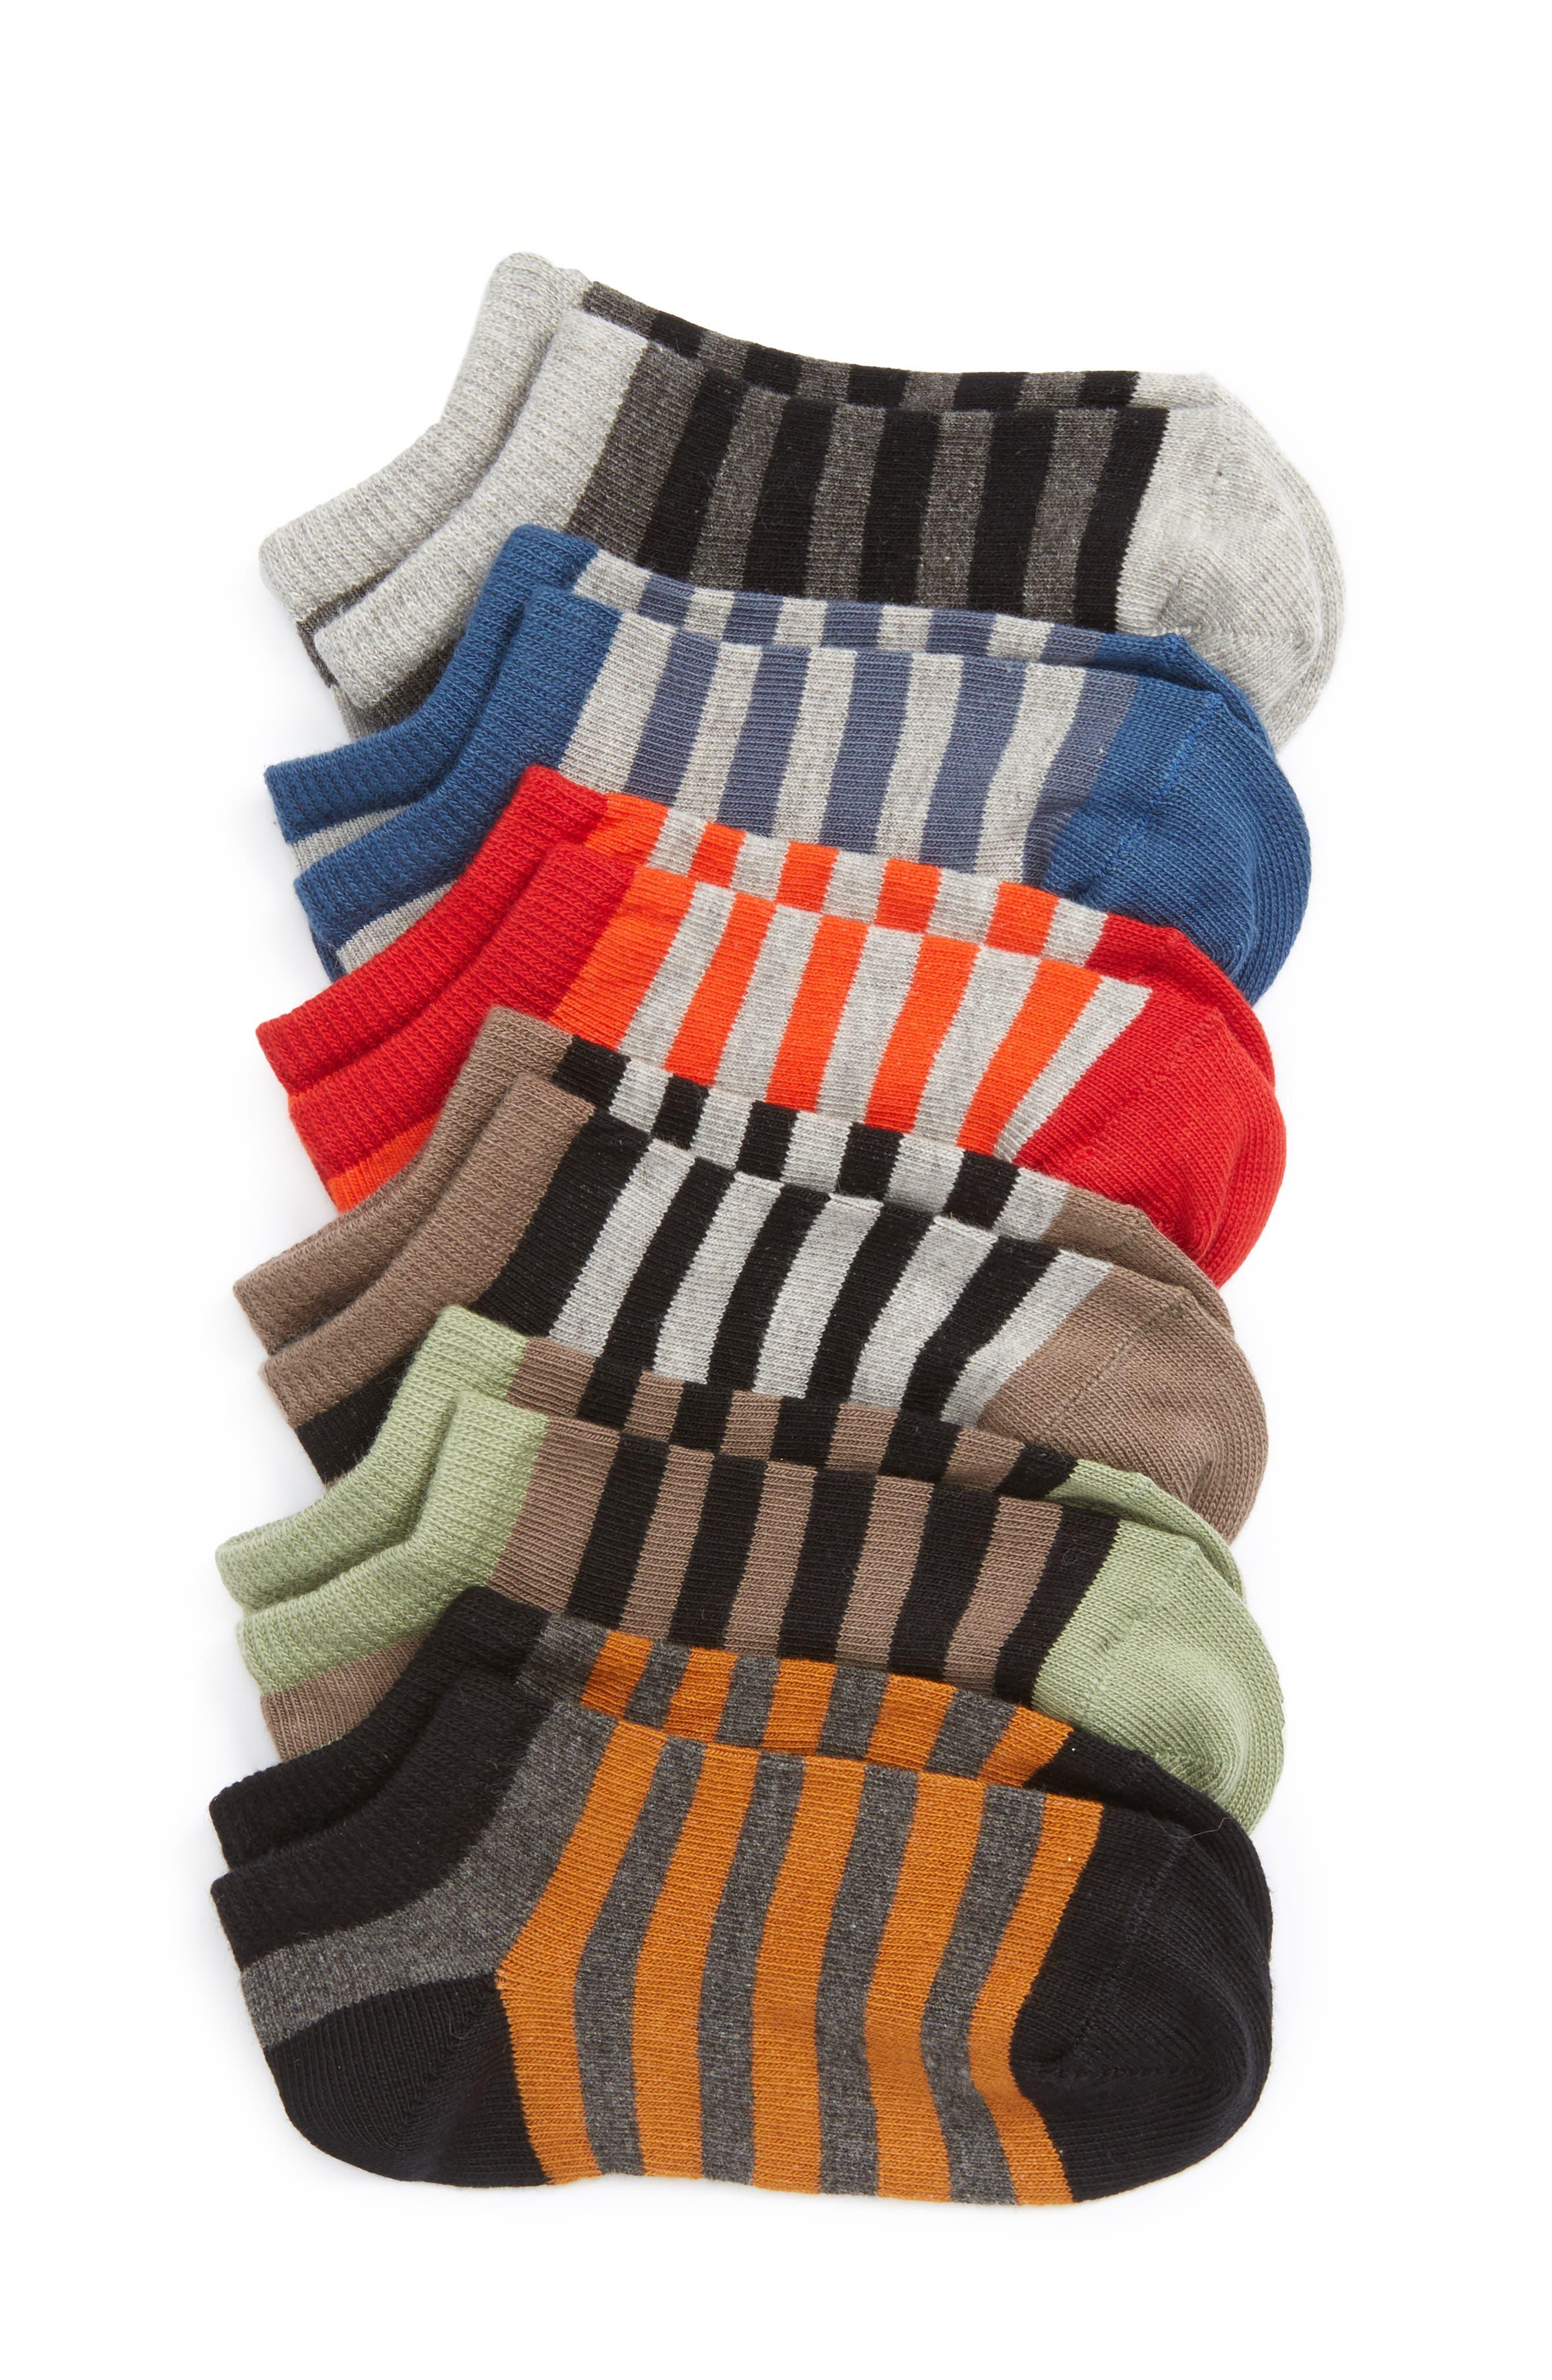 Main Image - Tucker + Tate Assorted 6-Pack No-Show Socks (Walker, Toddler, Little Kid & Big Kid)